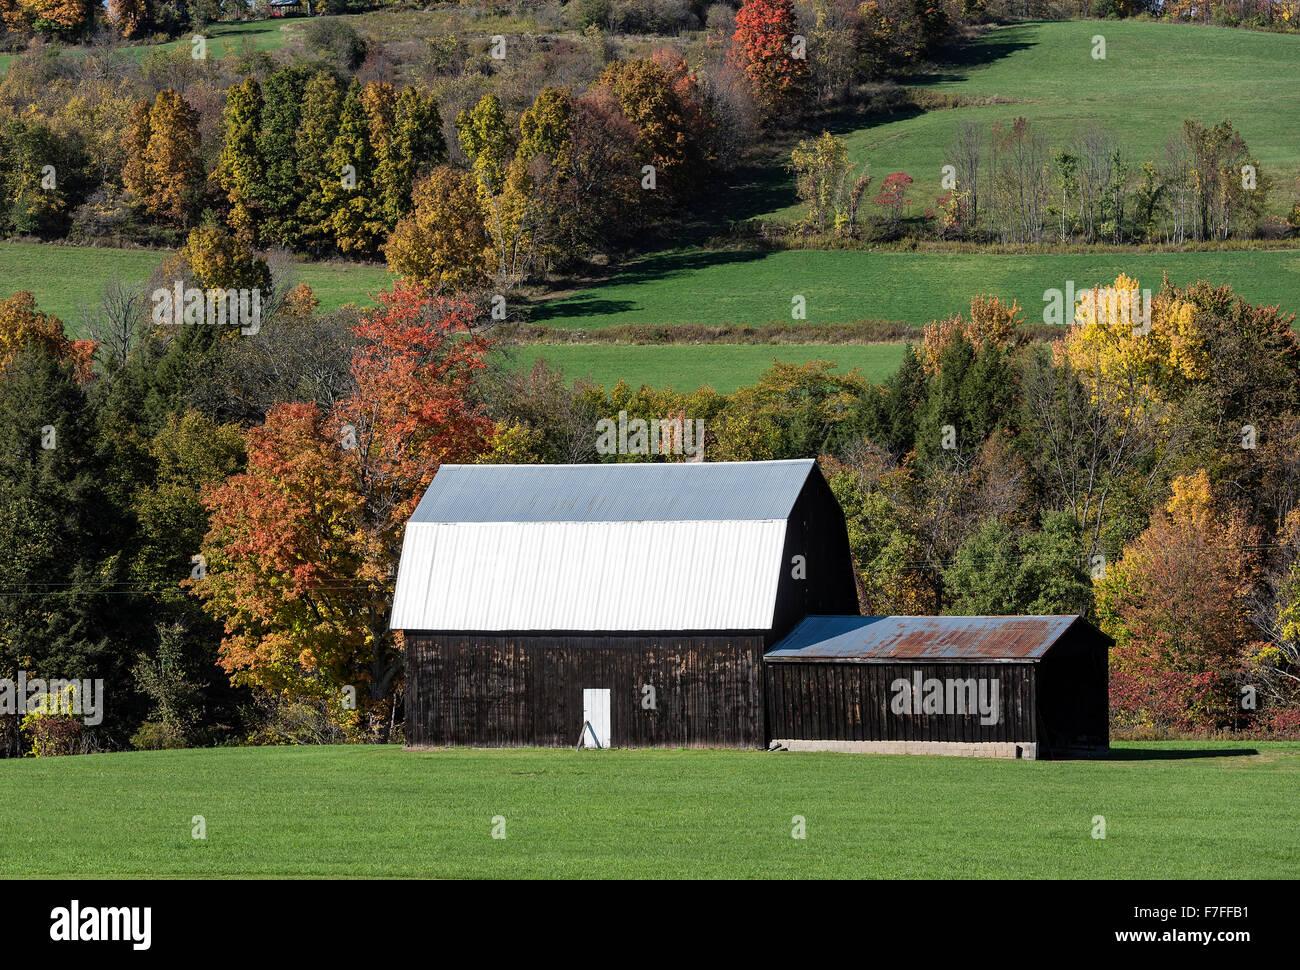 Rural barn with tin roof, Covington, New York, USA - Stock Image